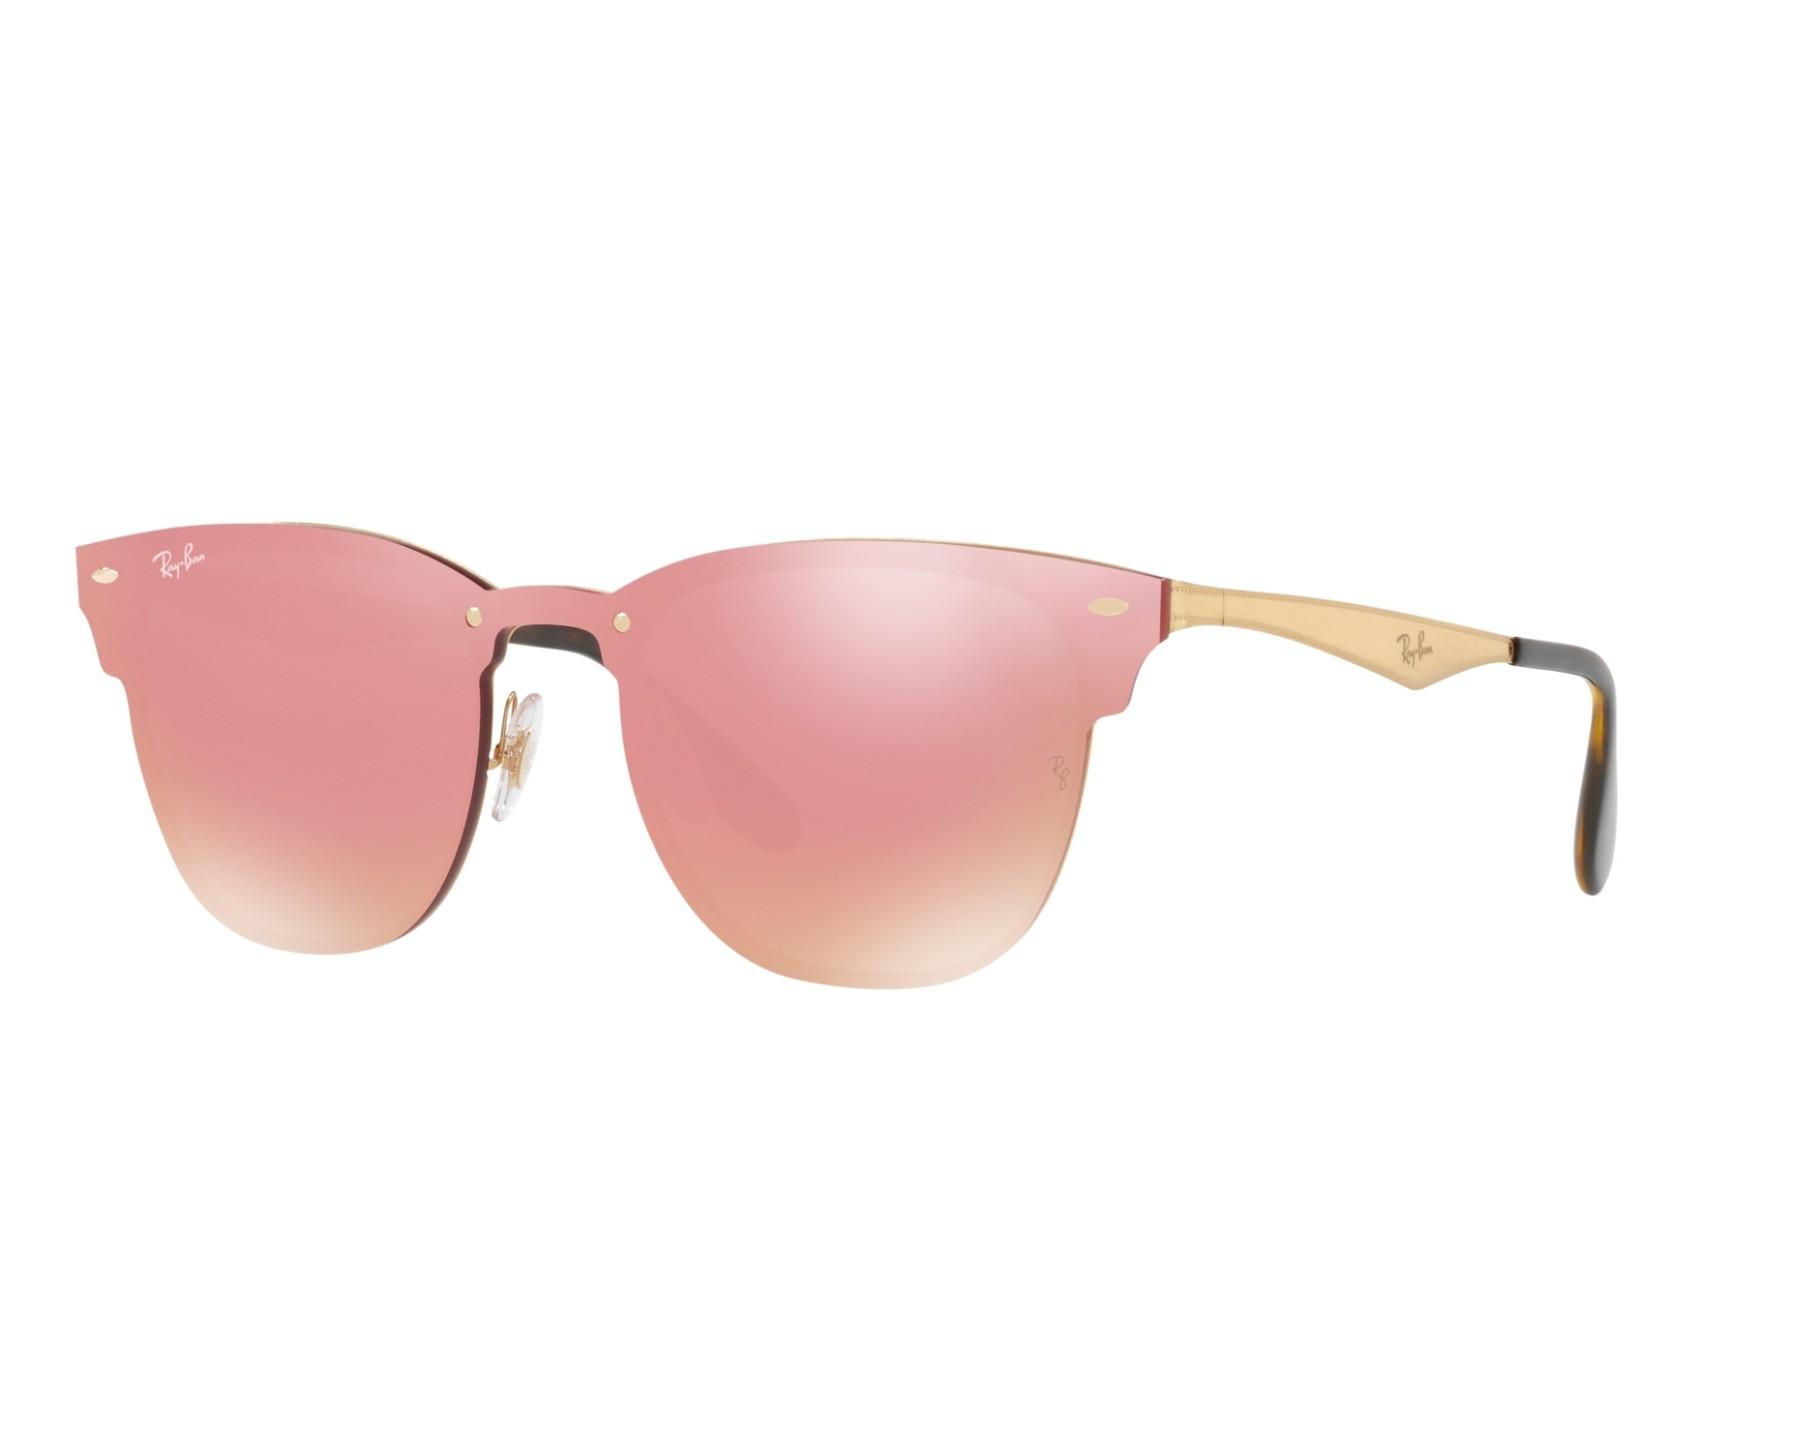 9a4c94baccc5a Gafas de Sol Ray-Ban Blaze Clubmaster RB-3576-N 043 E4